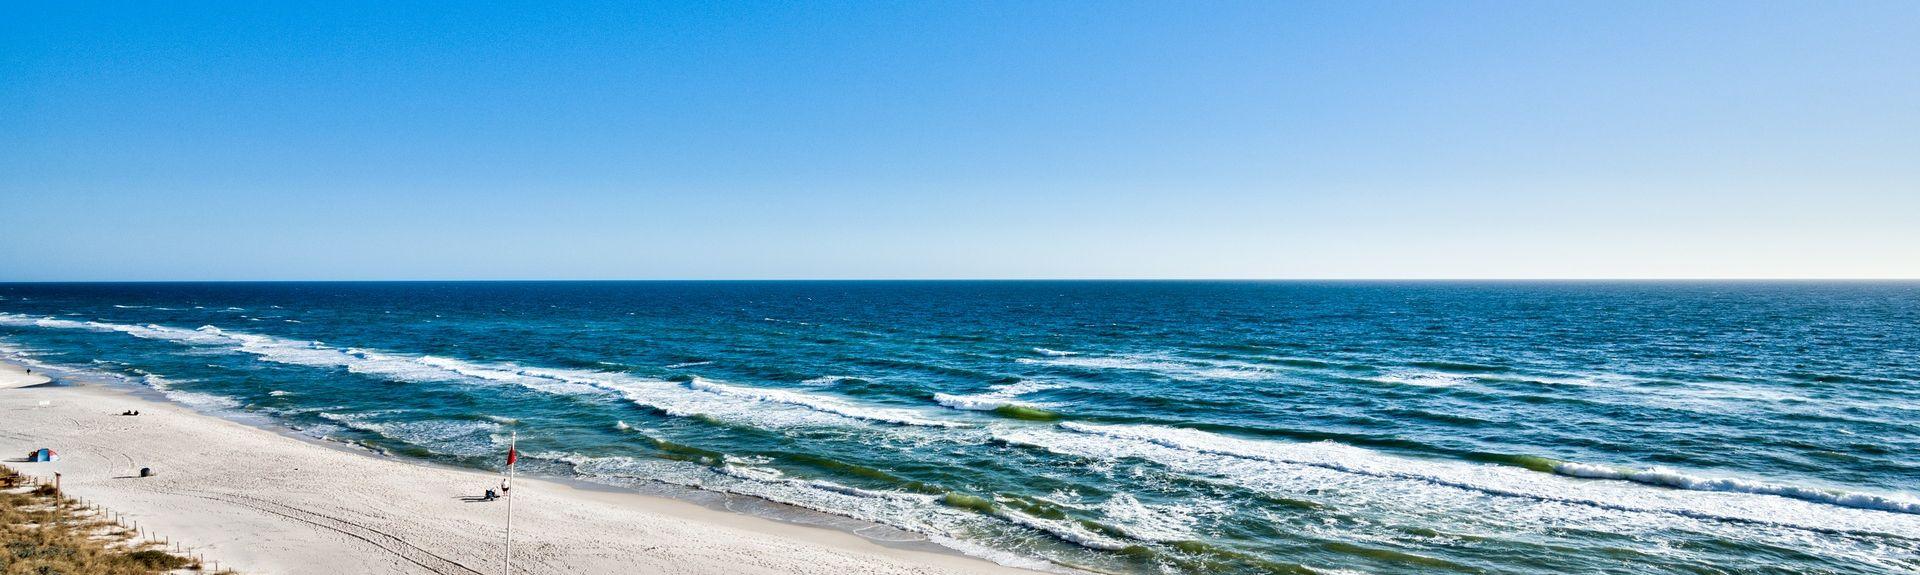 Celadon Beach Resort, Panama City Beach, FL, USA